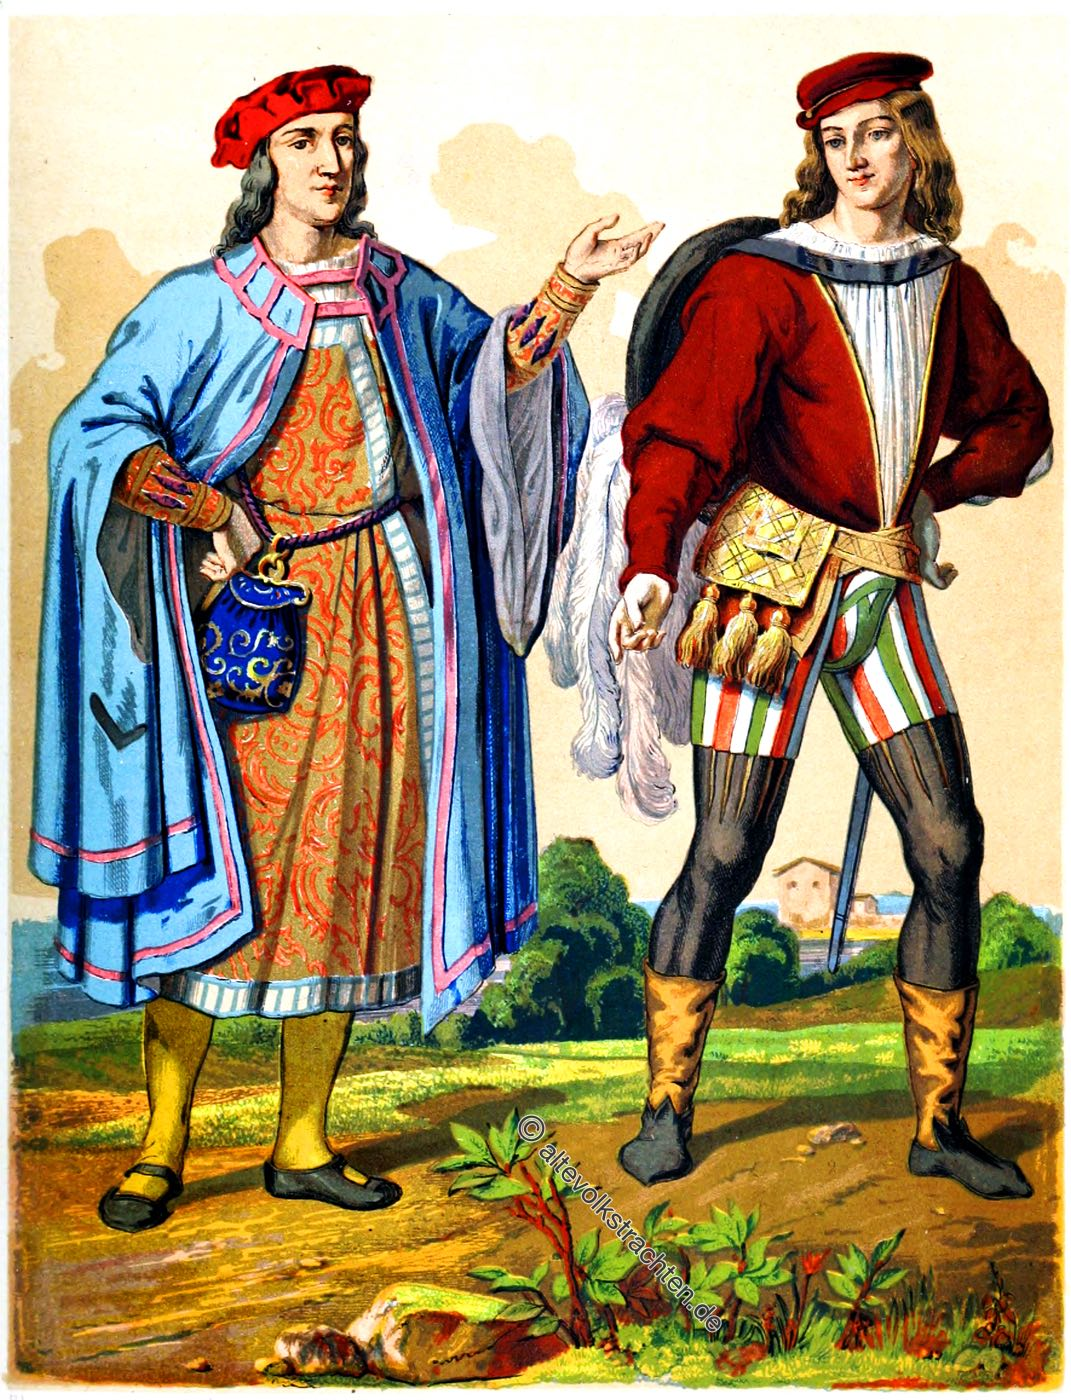 Courtisan, Angleterre, Gentleman, Moyen Age, Renaissance, Modes, Costumes, Paul Lacroix